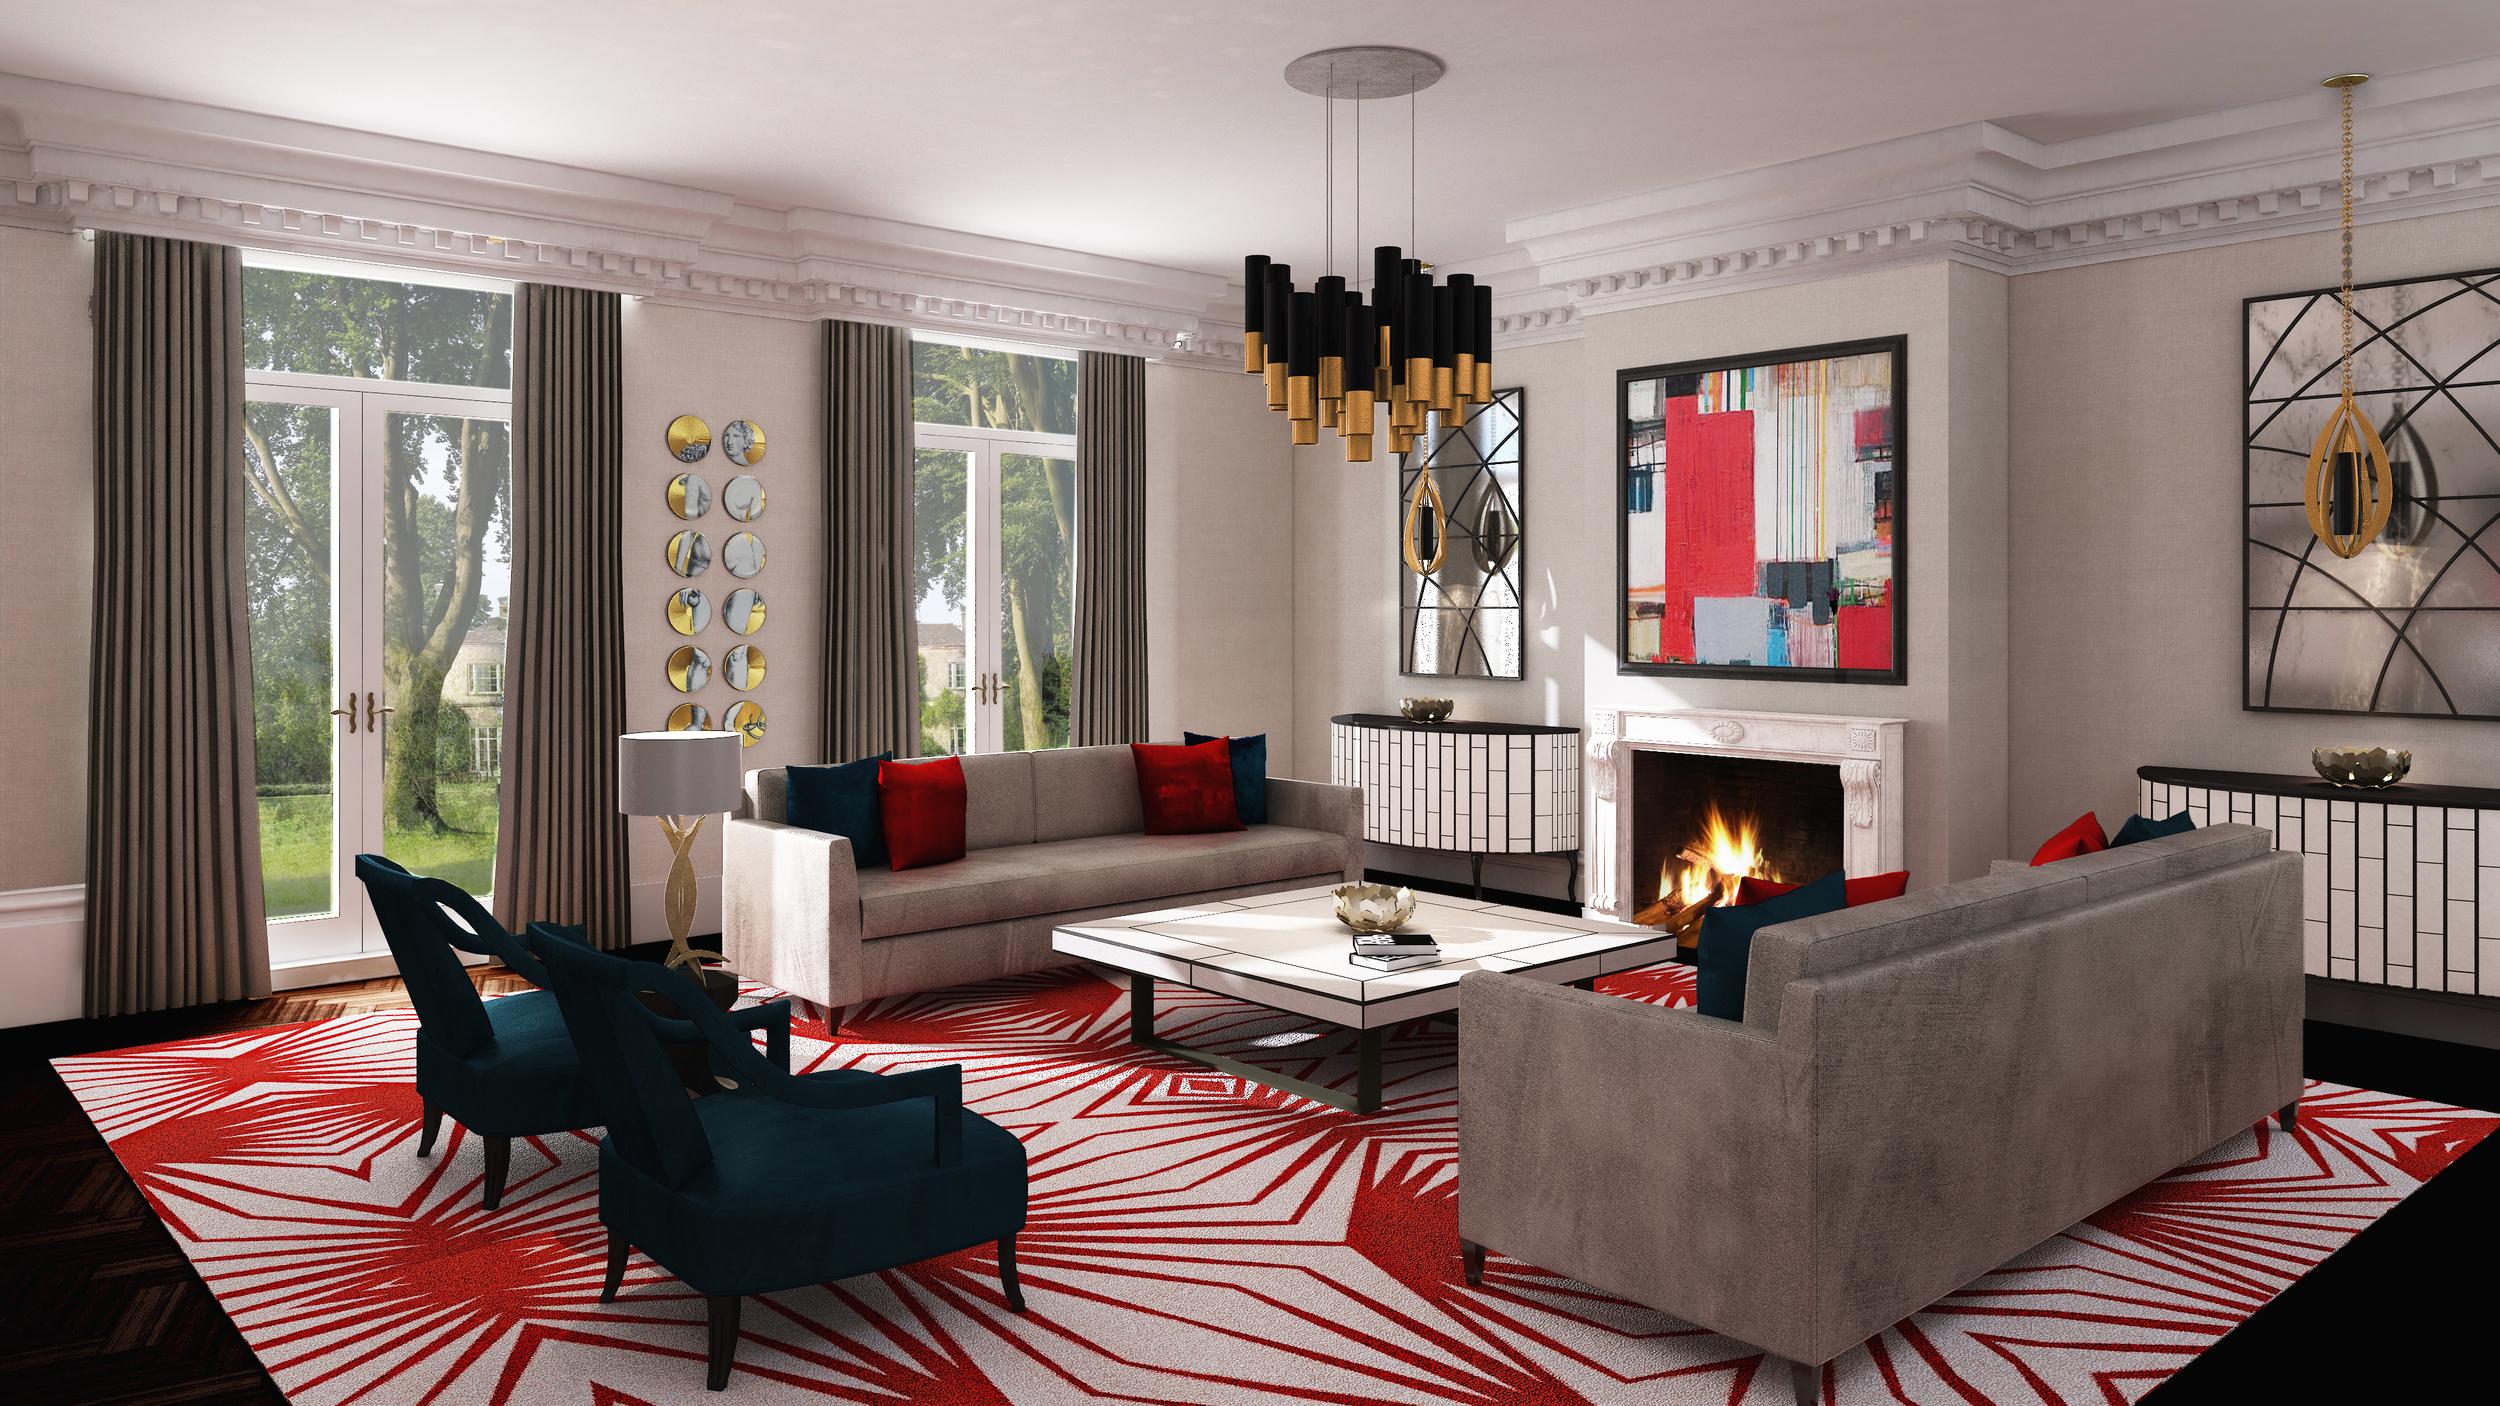 Luxury interior by high-end London interior designer Jo Hamilton